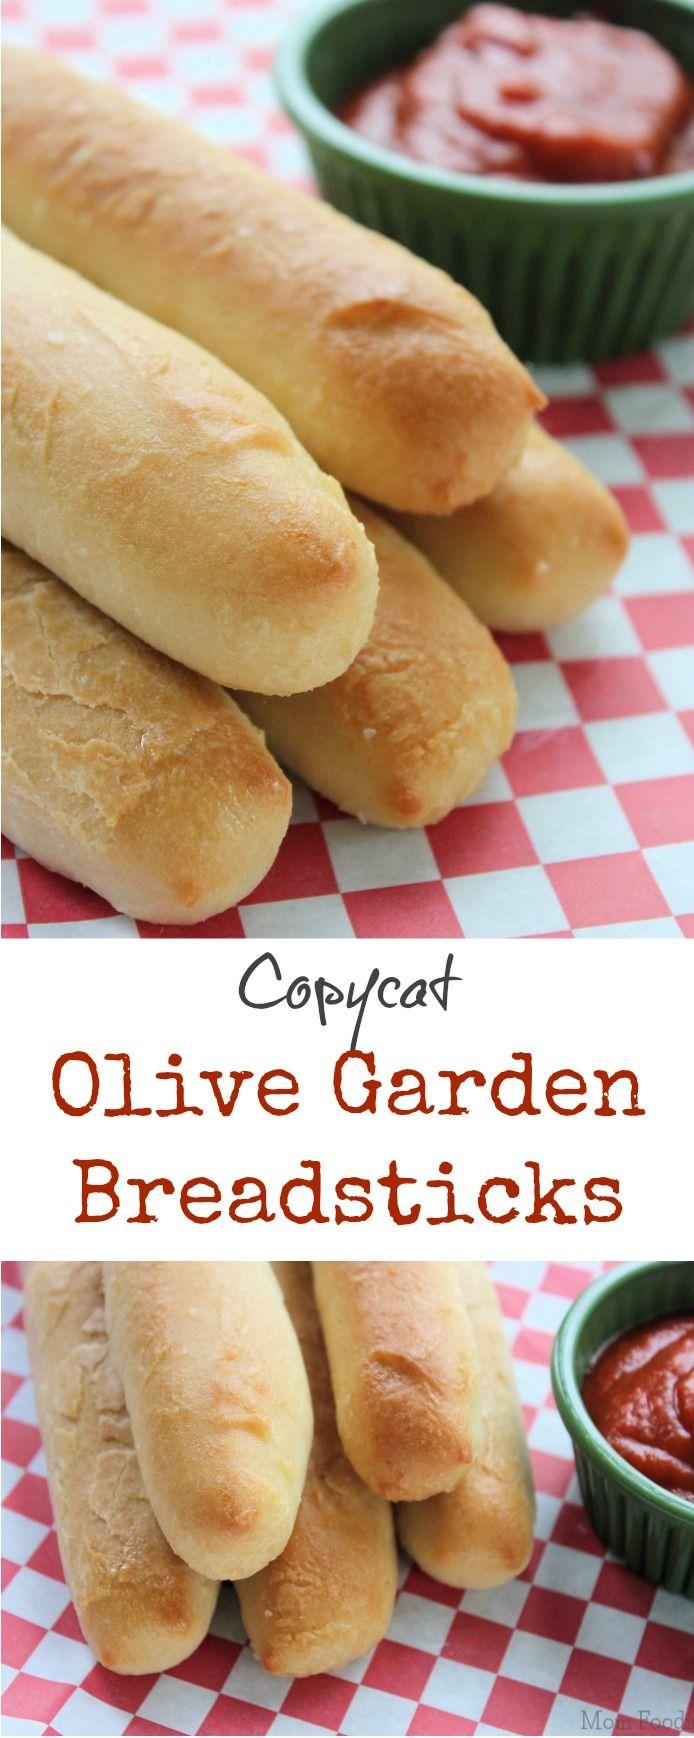 Copycat Olive Garden Breadsticks Recipe Gardens Olives And Homemade